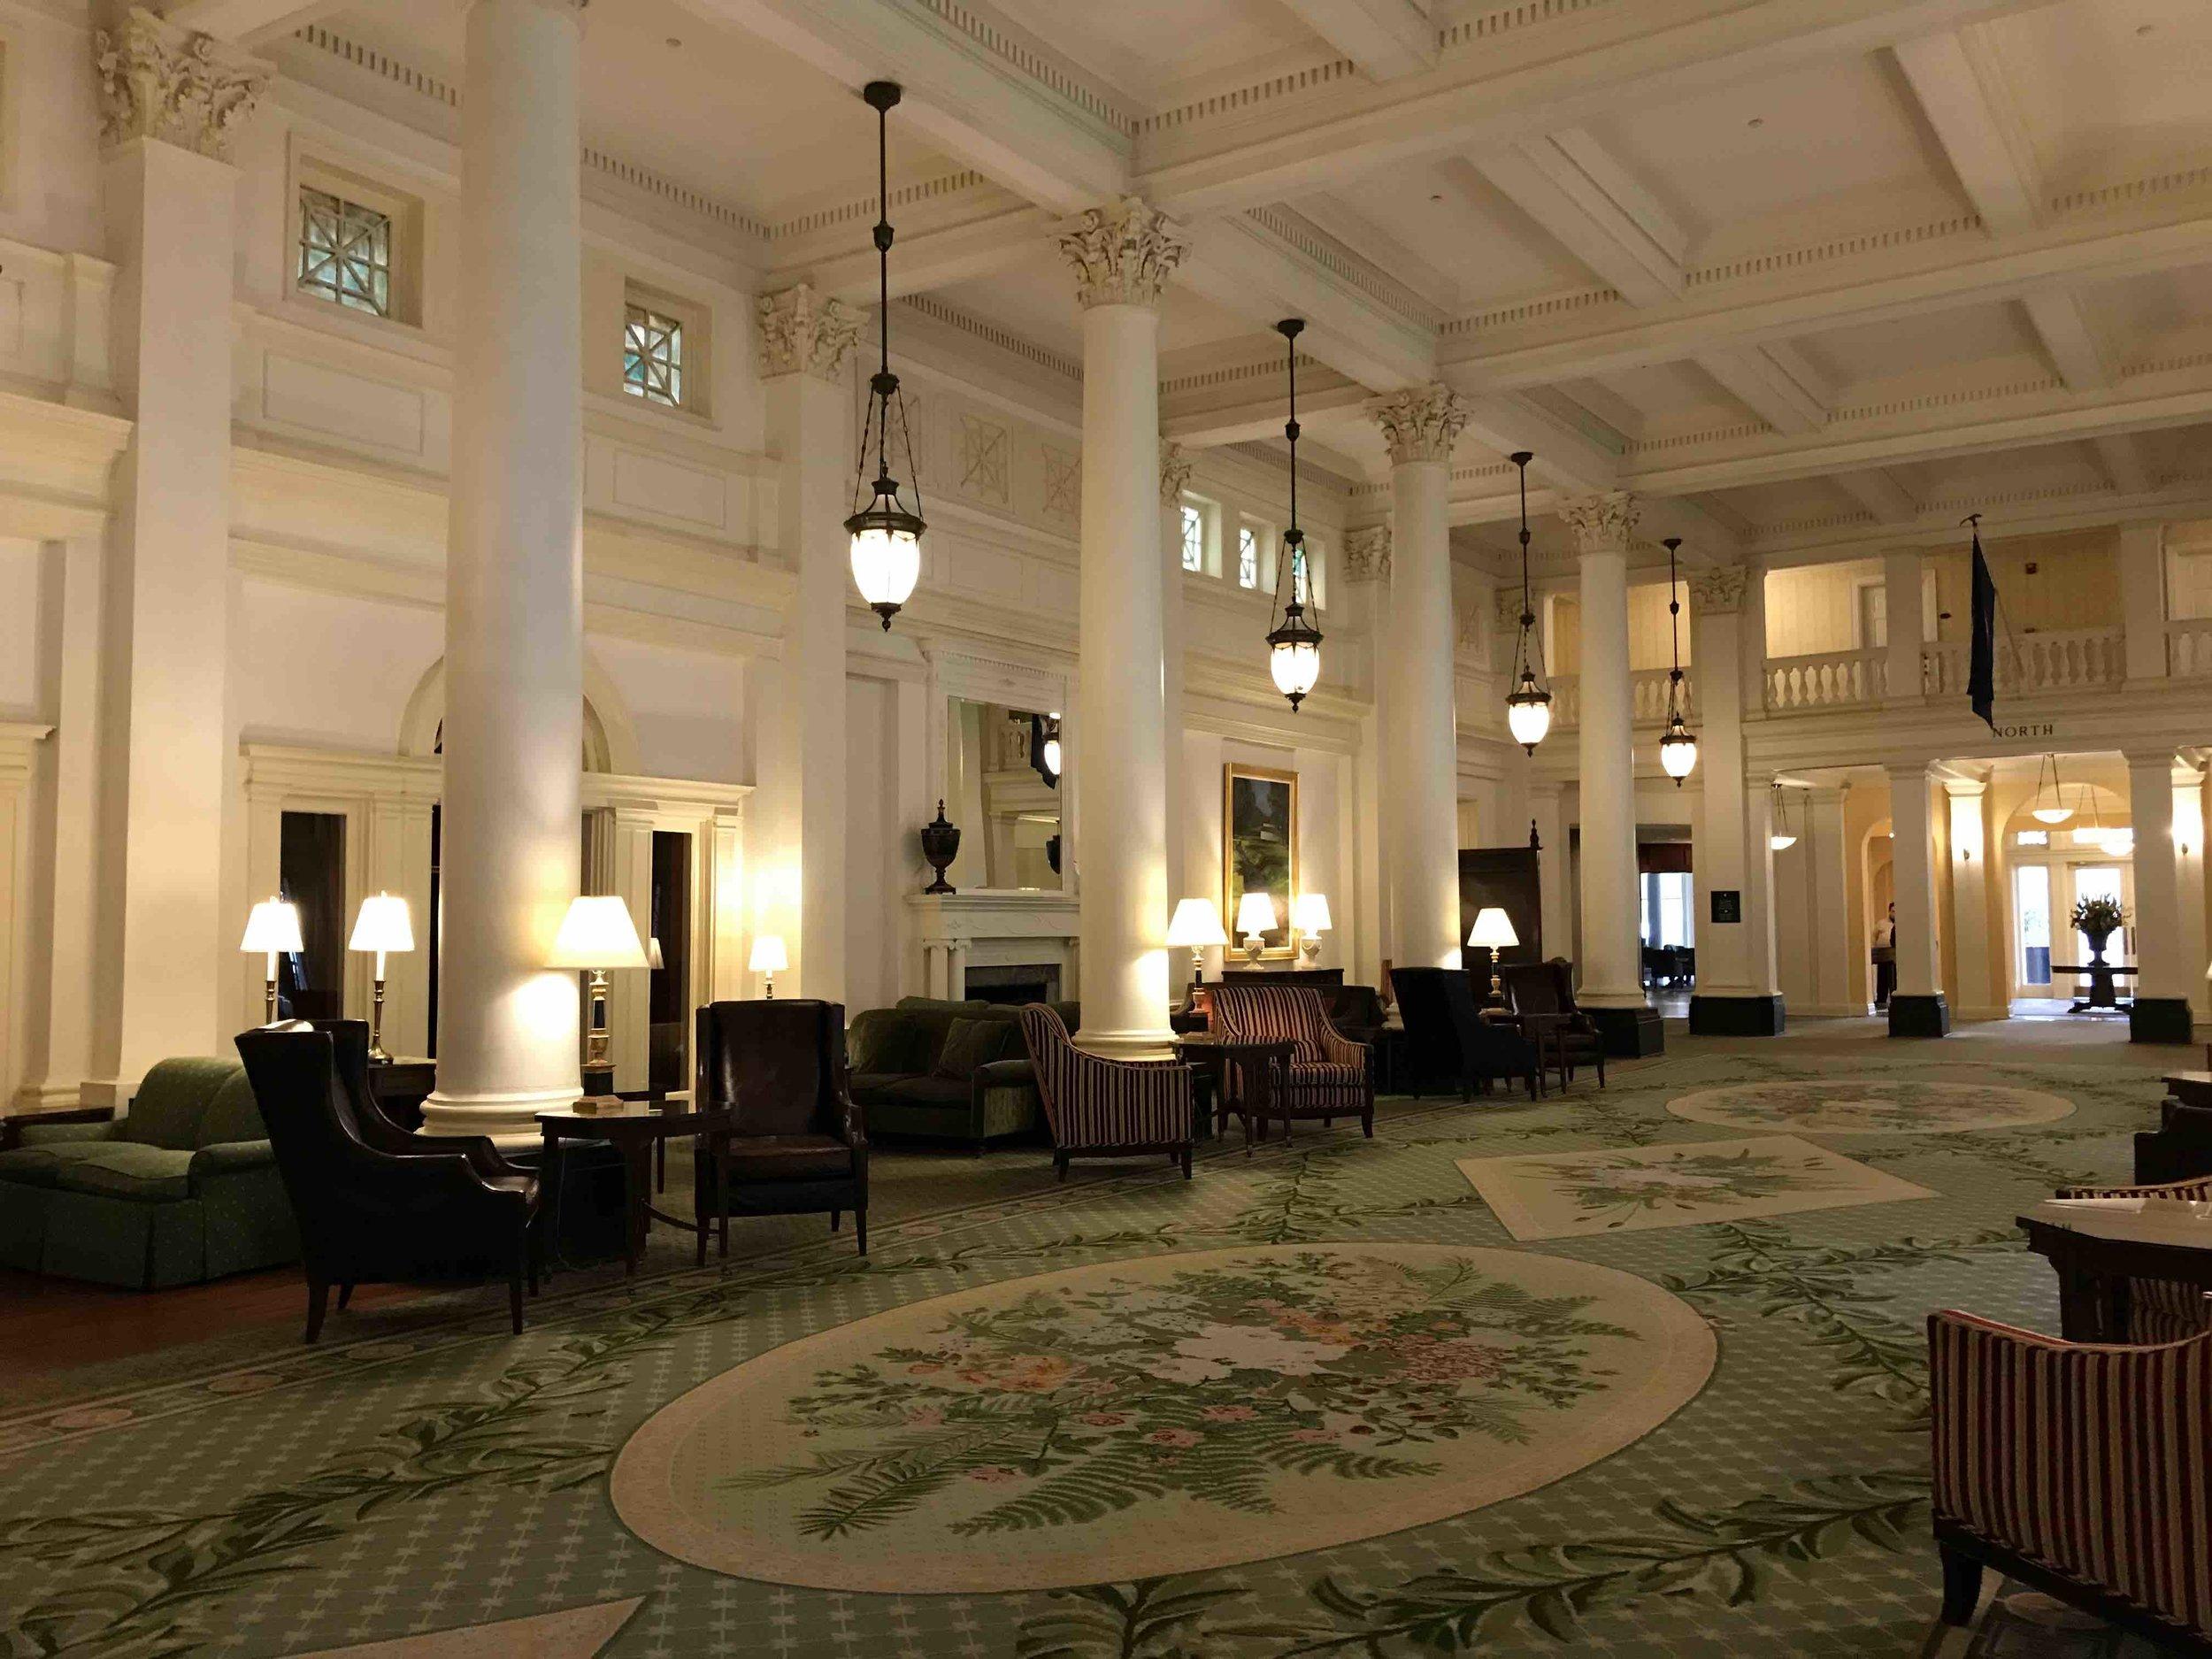 Lobby of the Omni Homestead Hotel